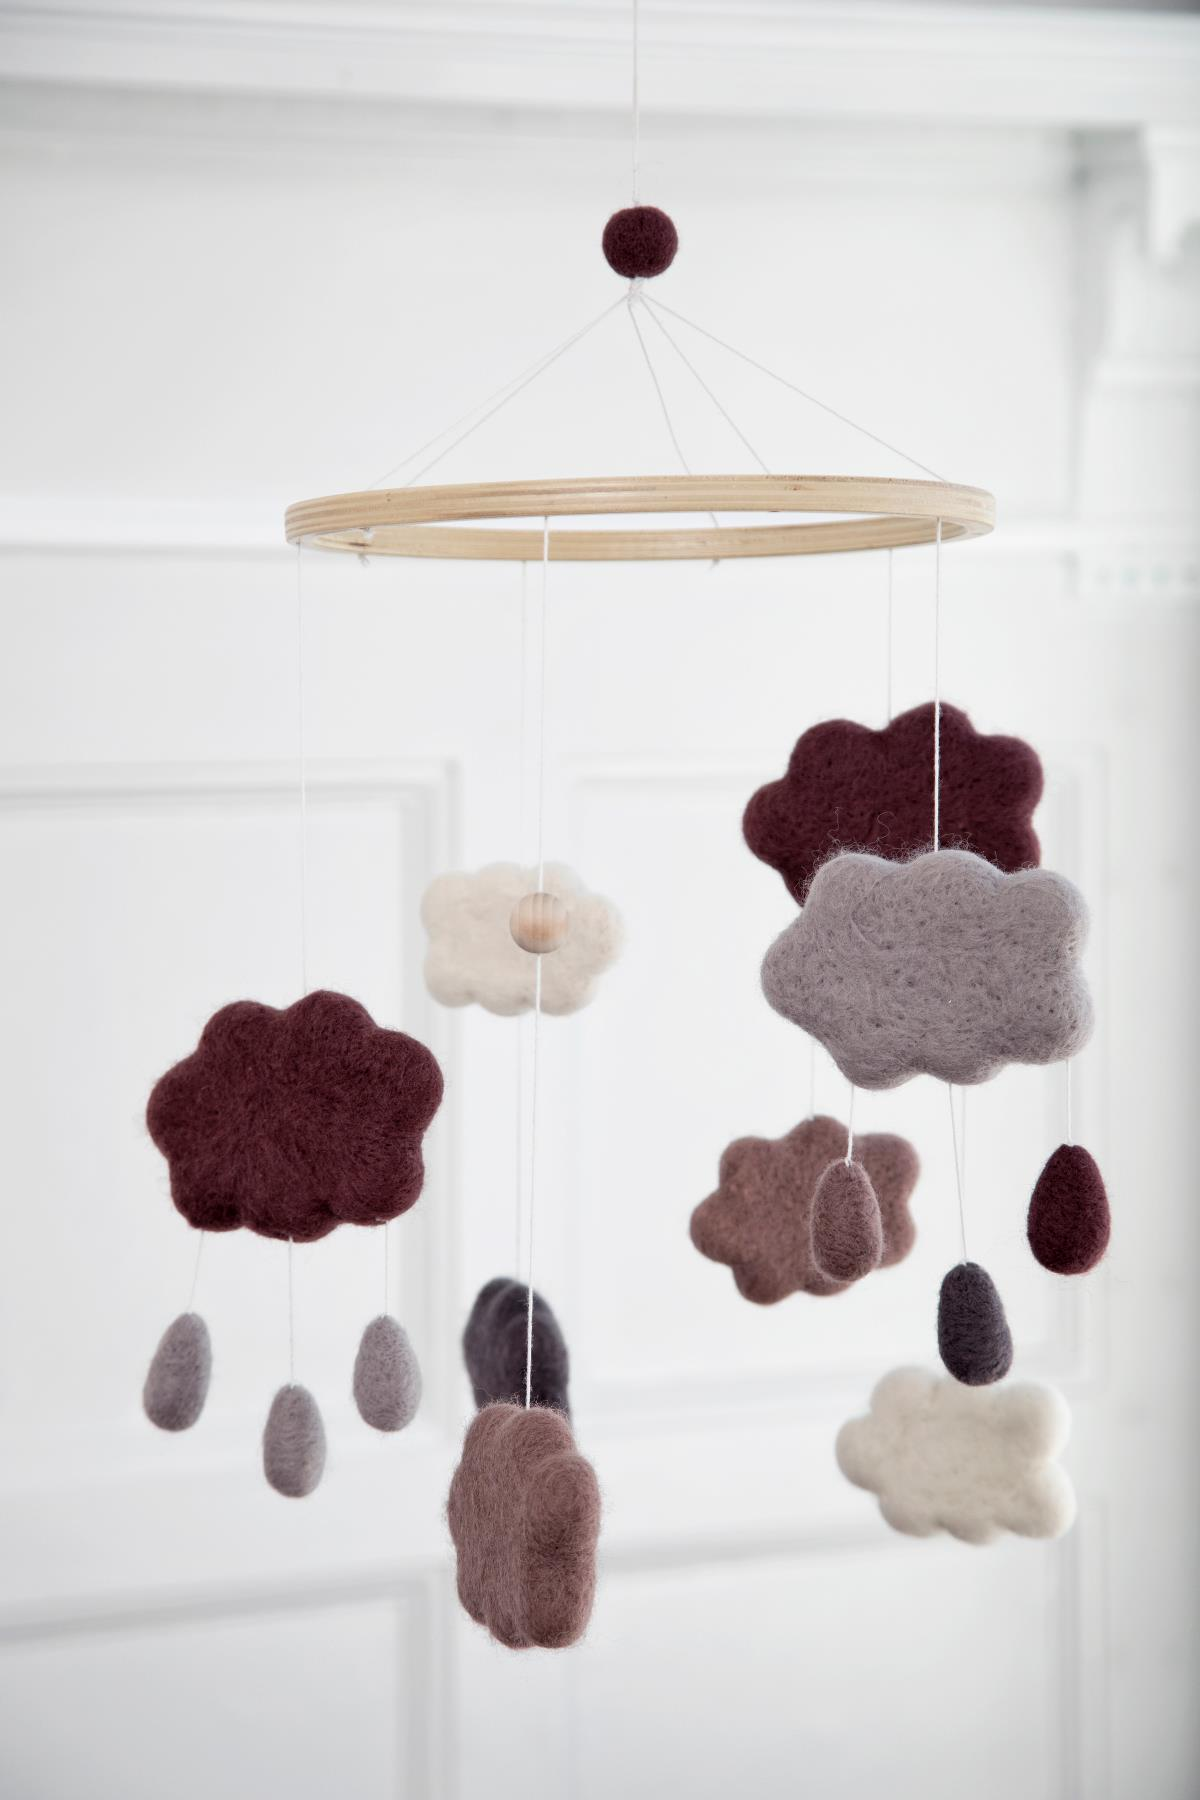 wolkenmobile aus filz pflaume von sebra interior bei panda. Black Bedroom Furniture Sets. Home Design Ideas